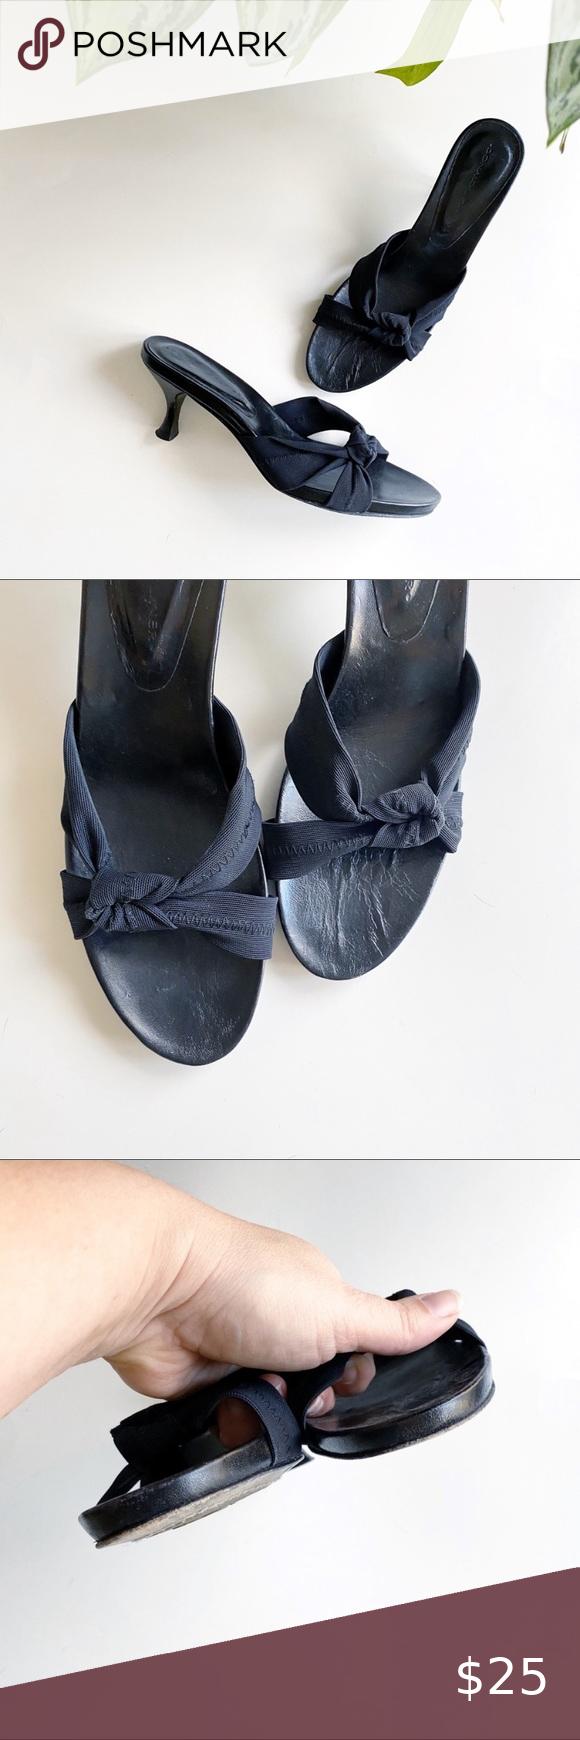 Donald J Pliner Fabric Knot Kitten Heel Sandals In 2020 Kitten Heel Sandals Kitten Heels Sandals Heels